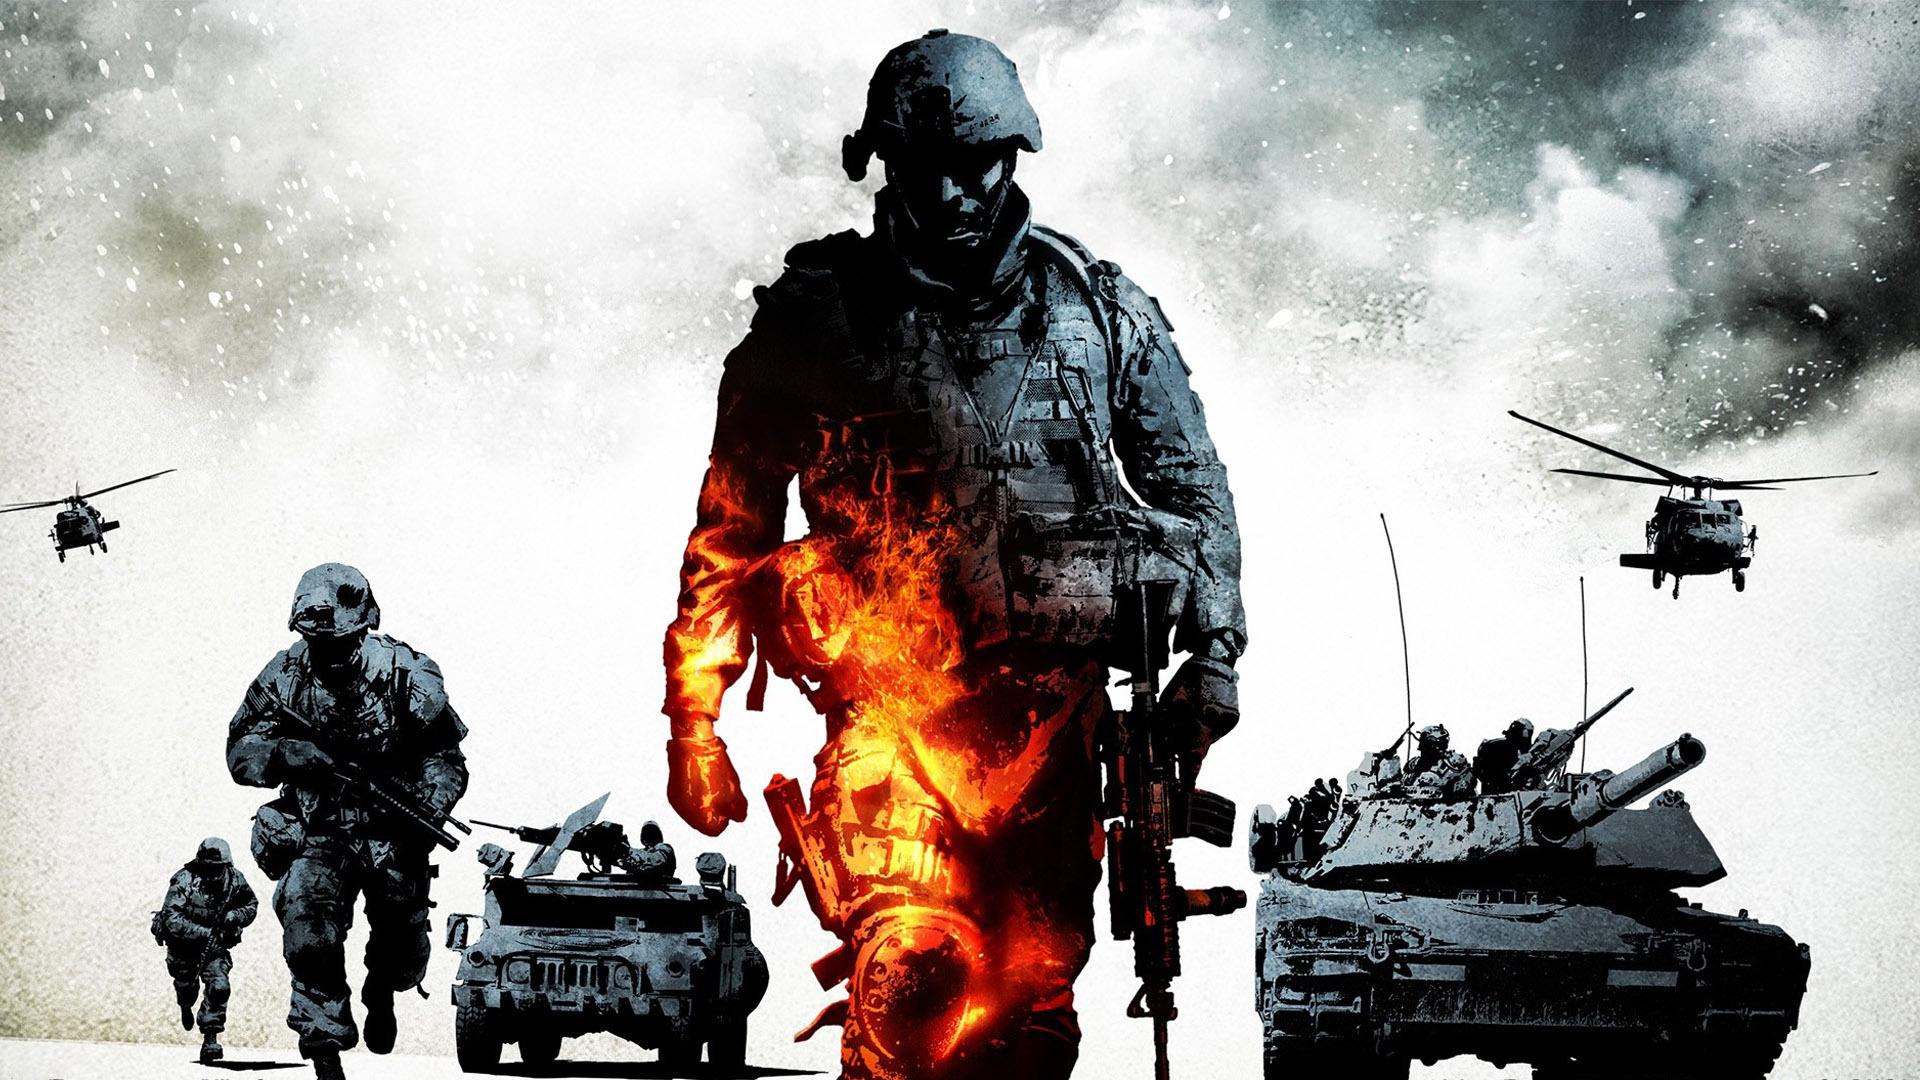 Battlefield   Bad Company 2 wallpaper 5546 1920x1080